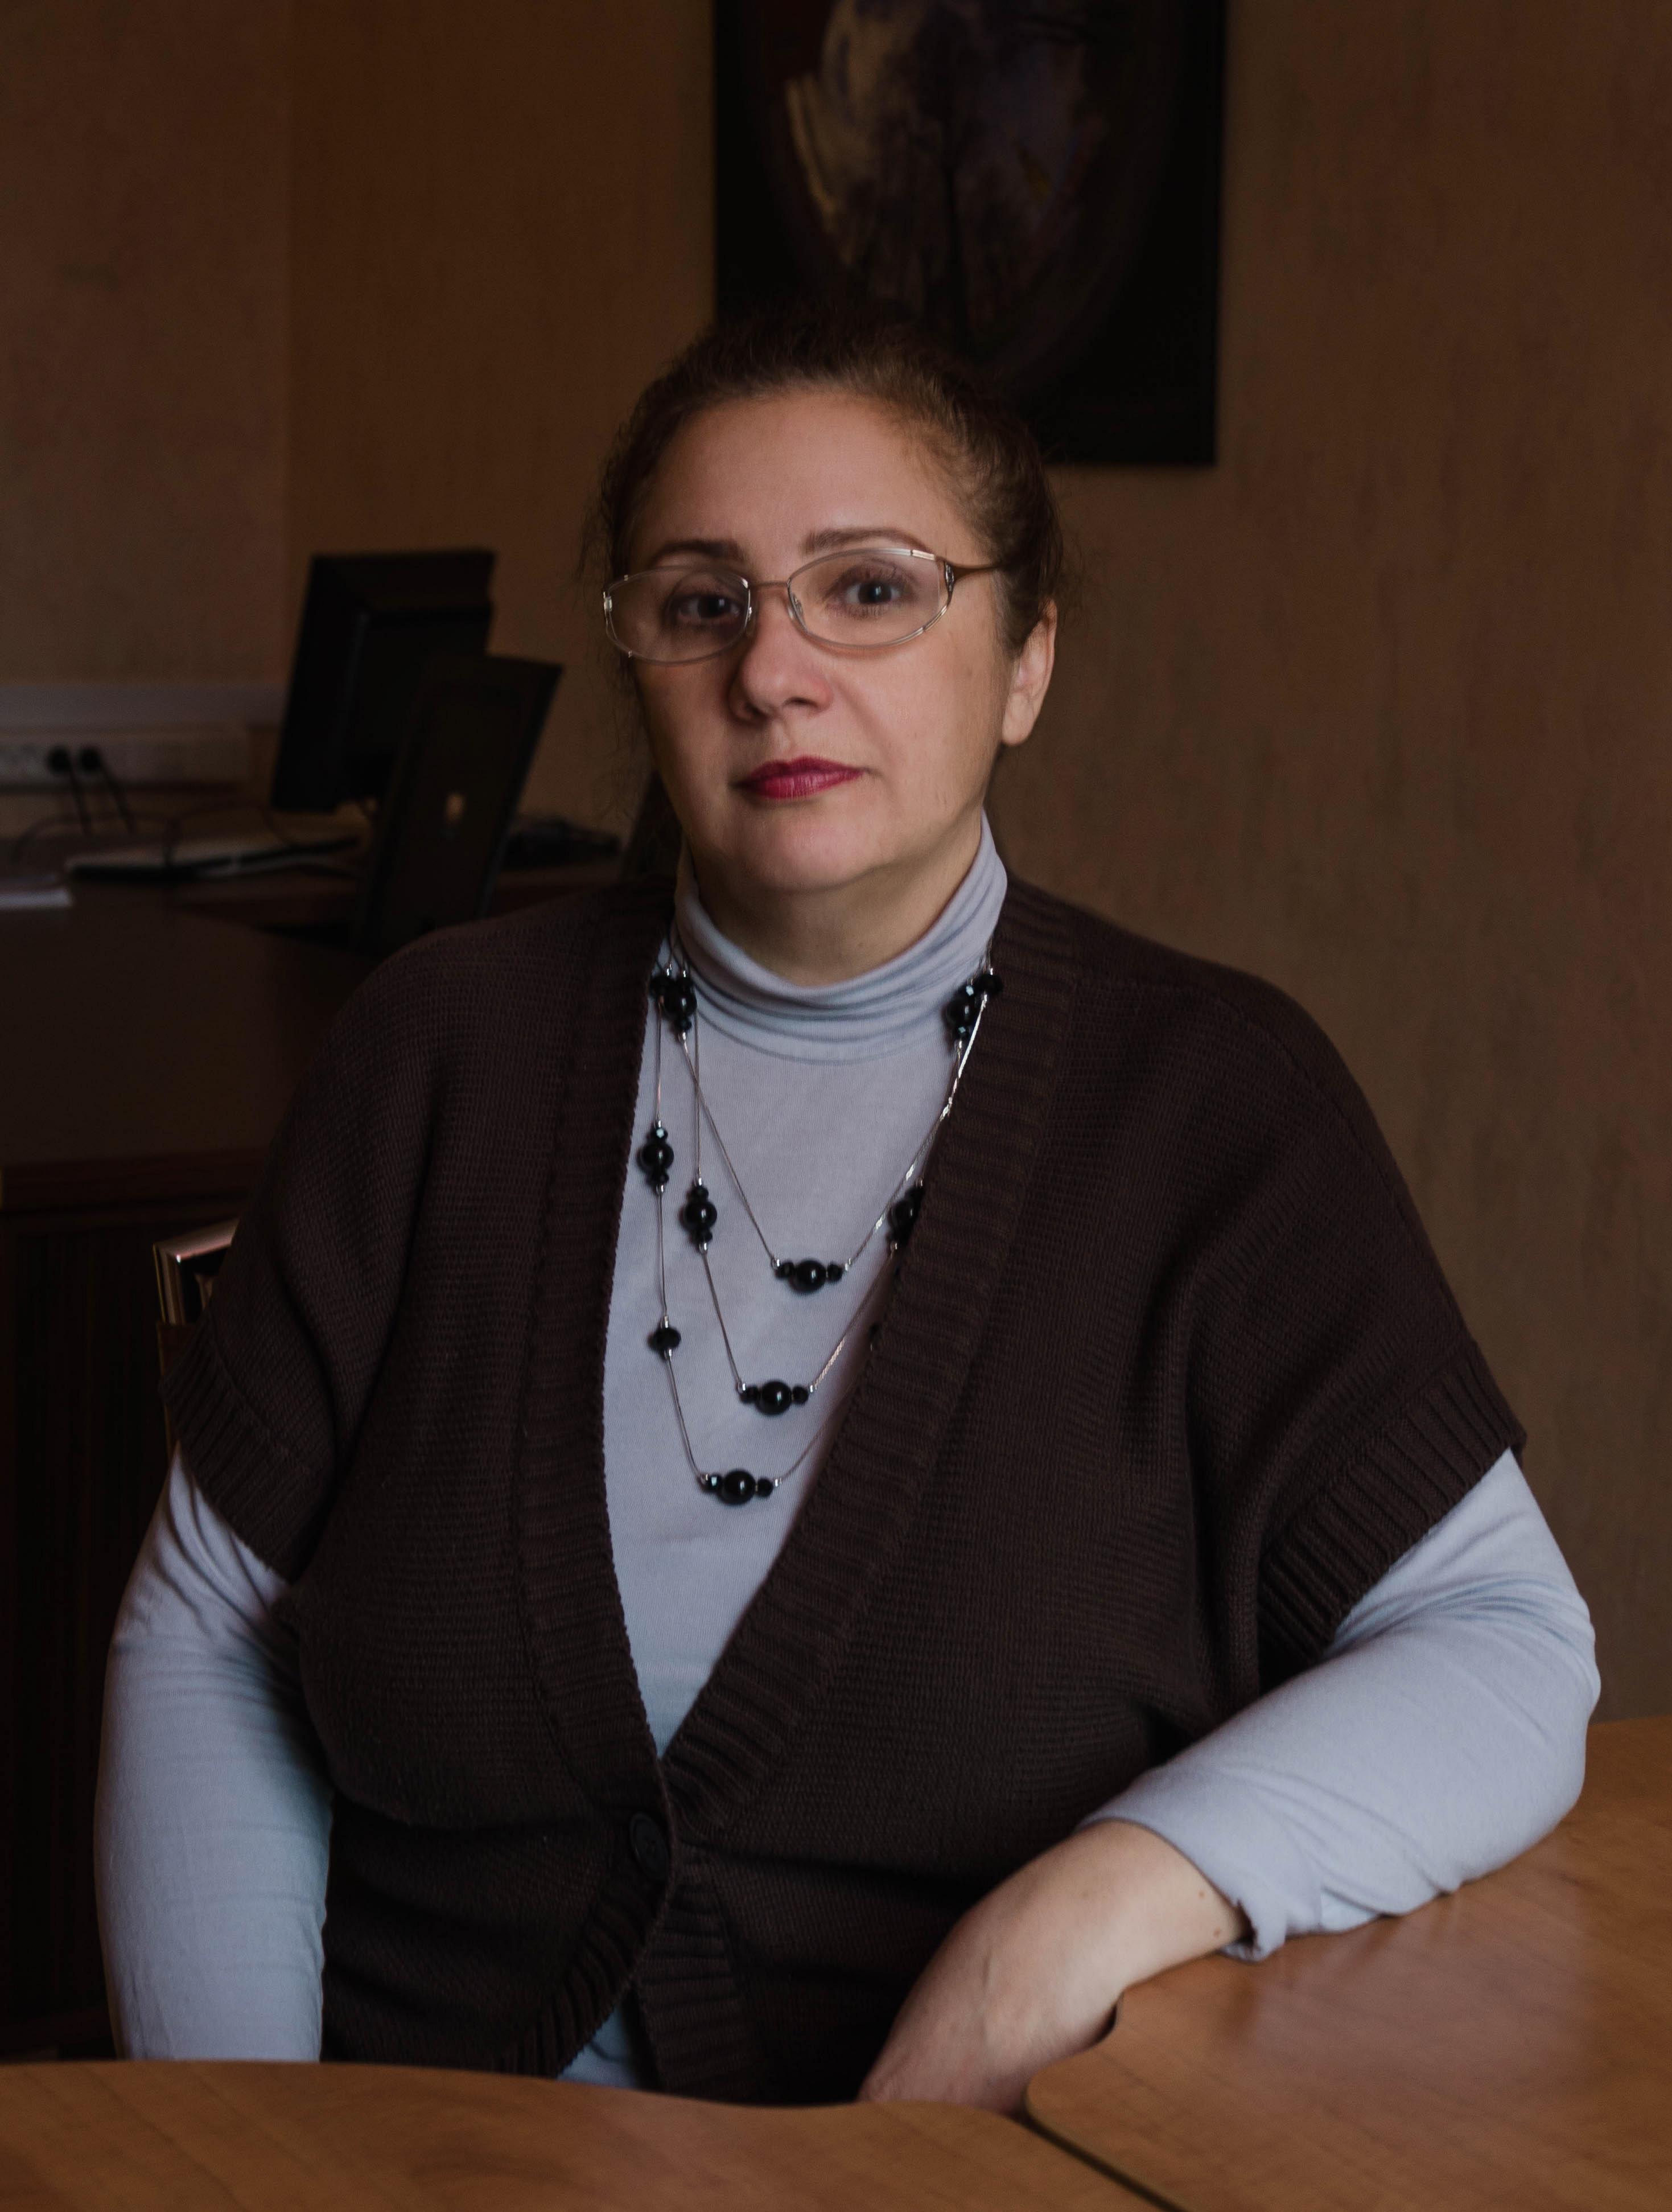 Атрашкевич Татьяна Олеговна